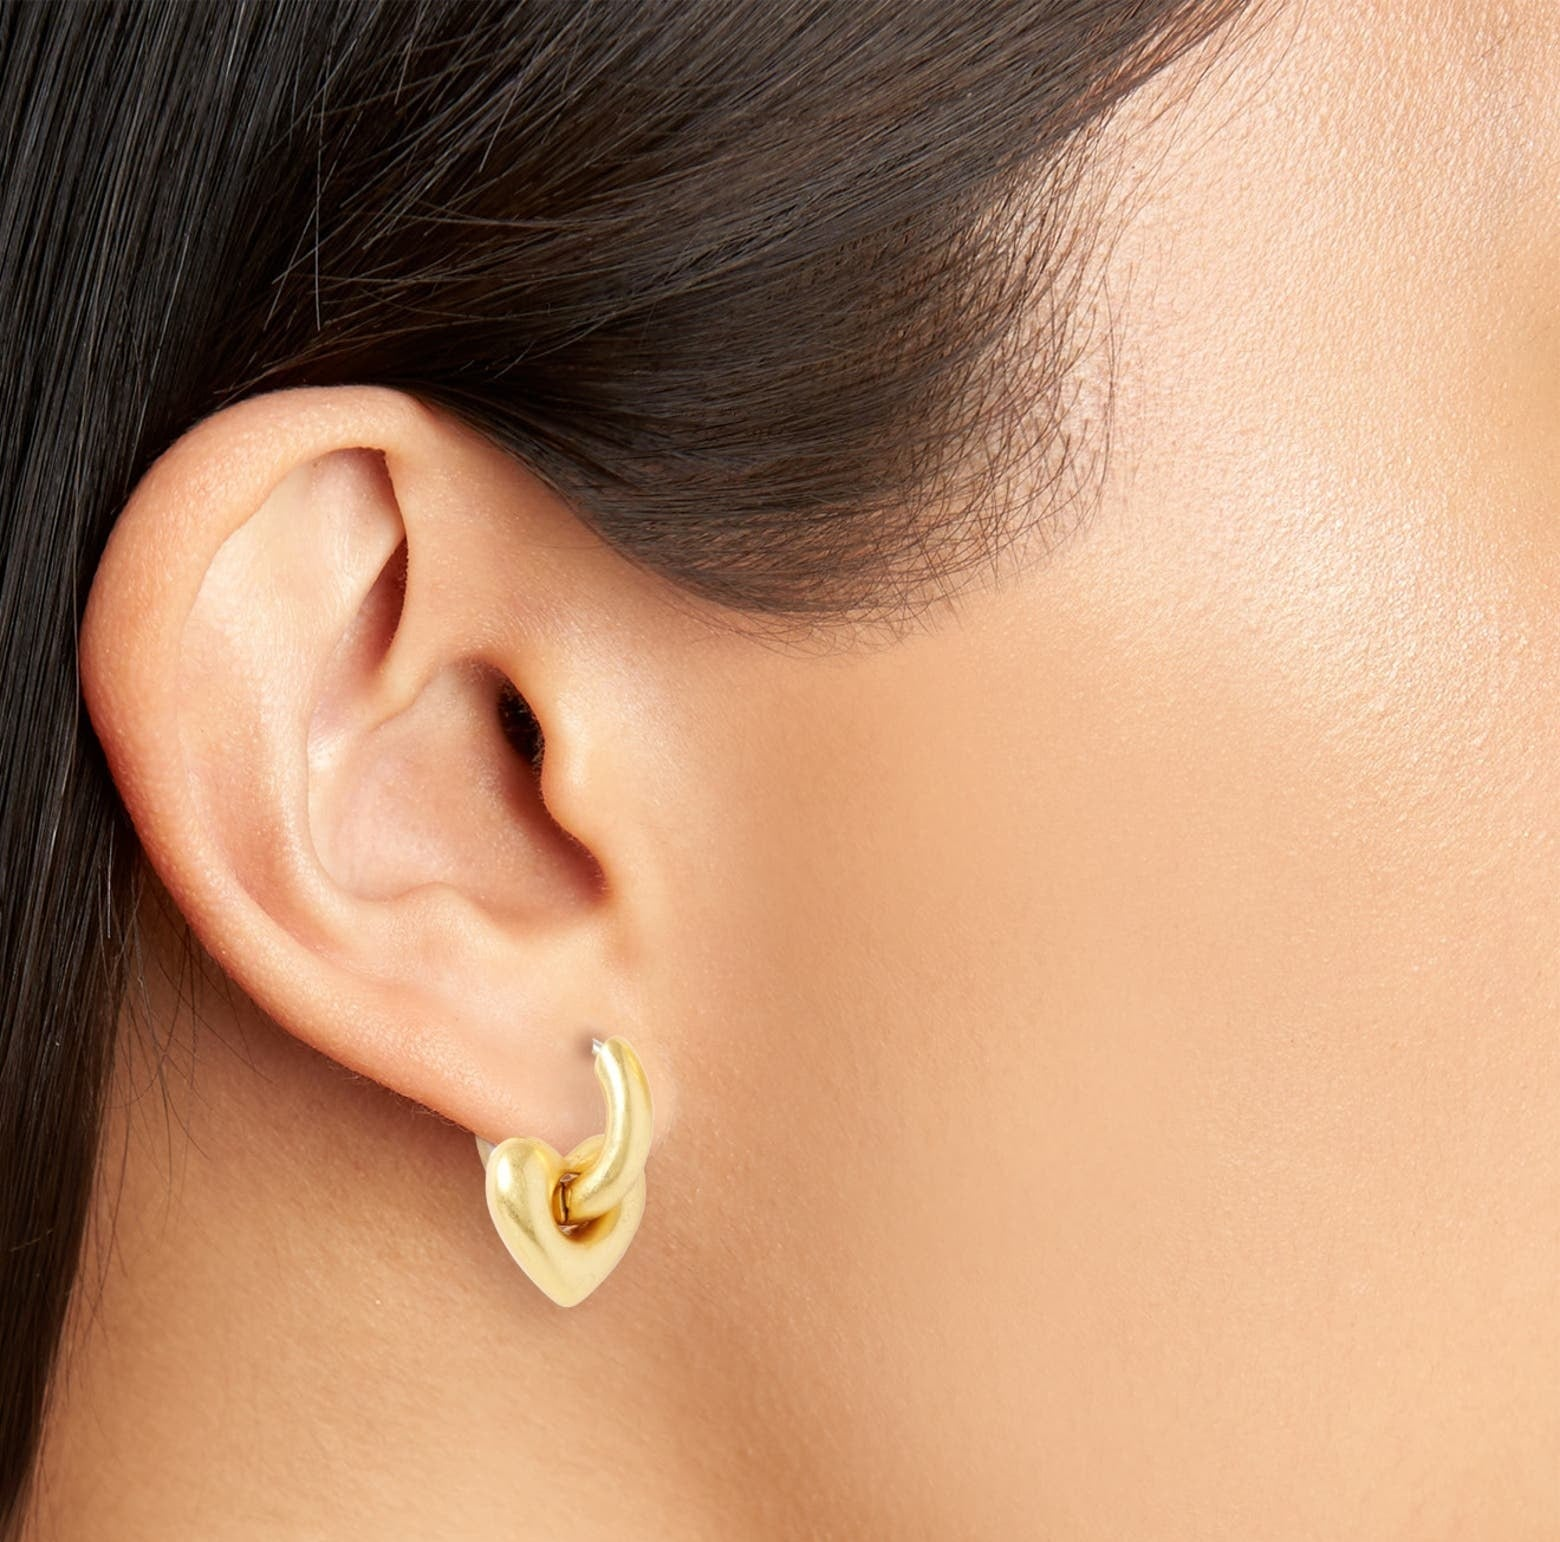 a thick, gold heart shape hoop inside of another gold hoop on an ear lobe.